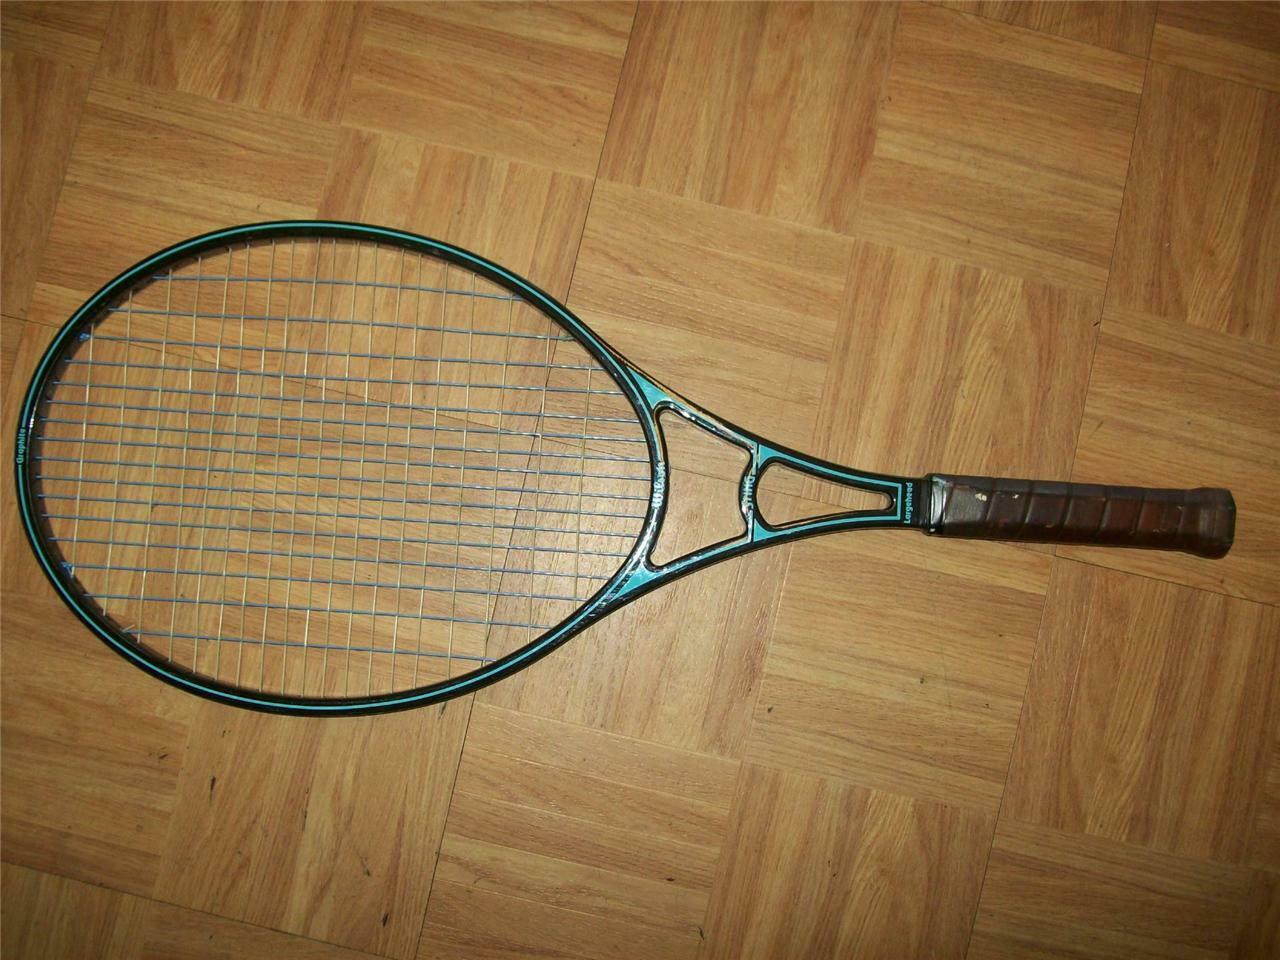 Wilson Sting Oversize 3/8 4 3/8 Oversize grip Tennis Racquet 31735c